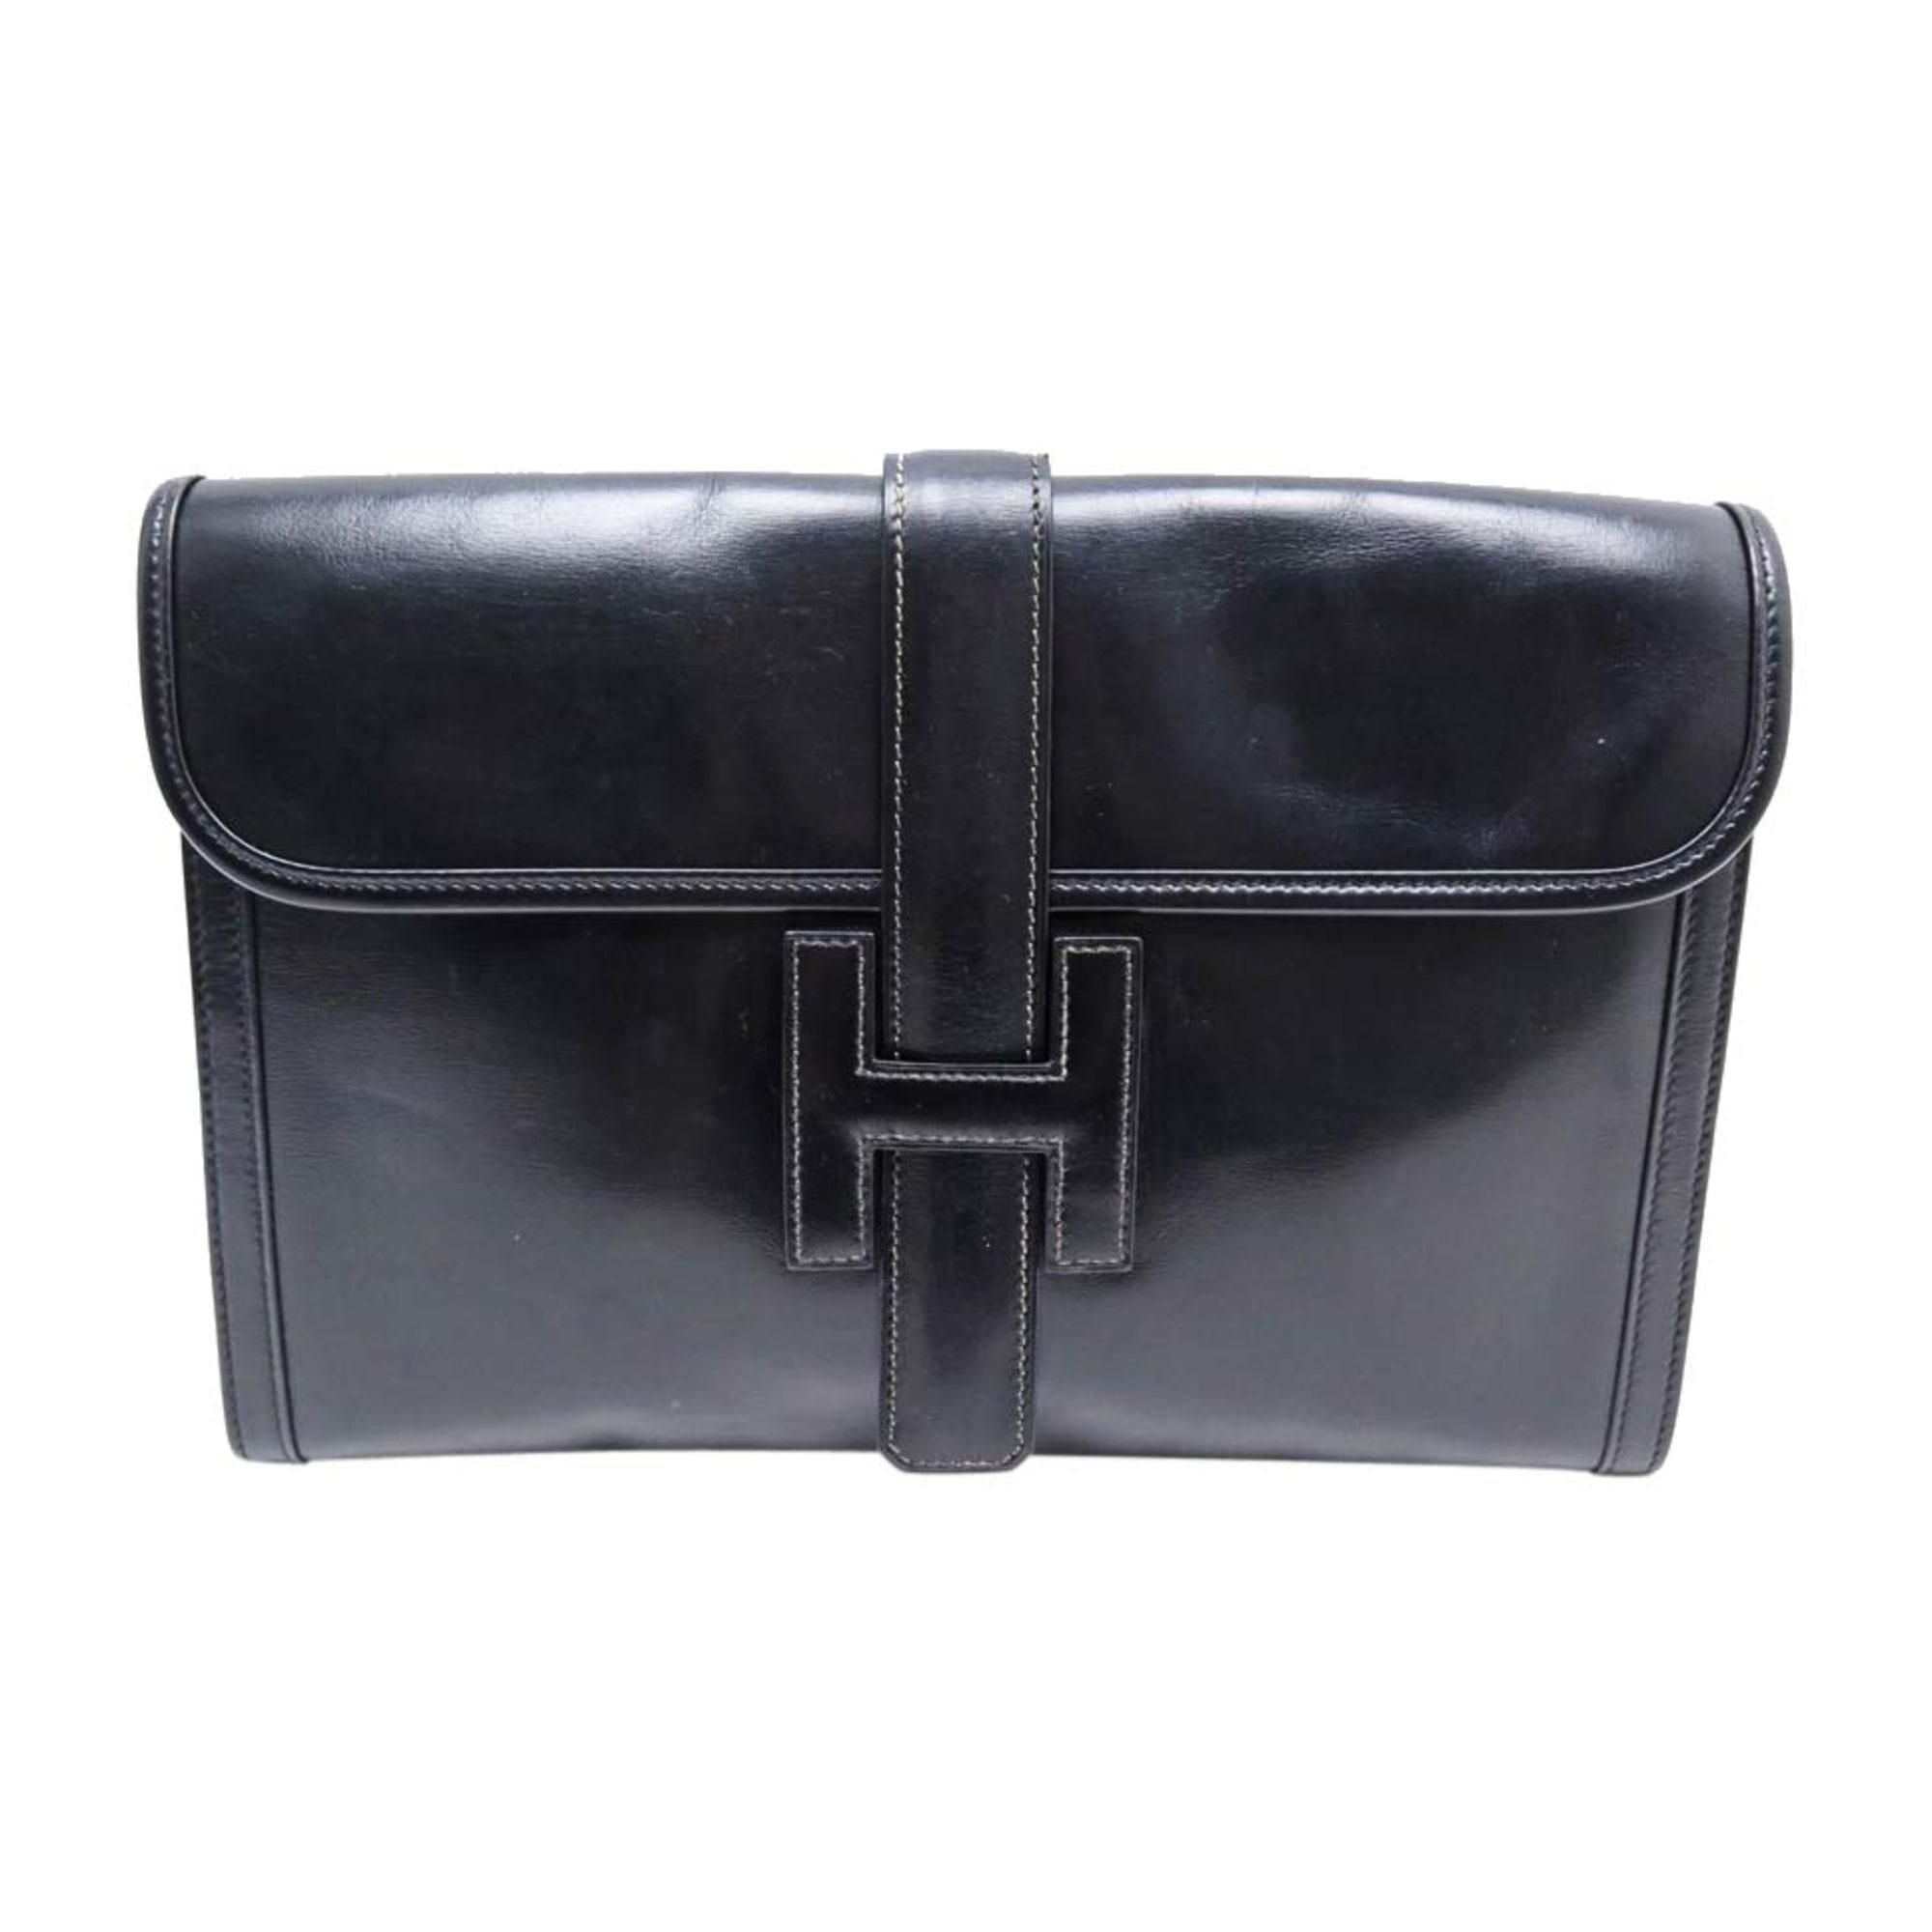 Par Vendu Pochette 7148216 Hermès Noir Encherexpert Paris16 0XwOPk8n